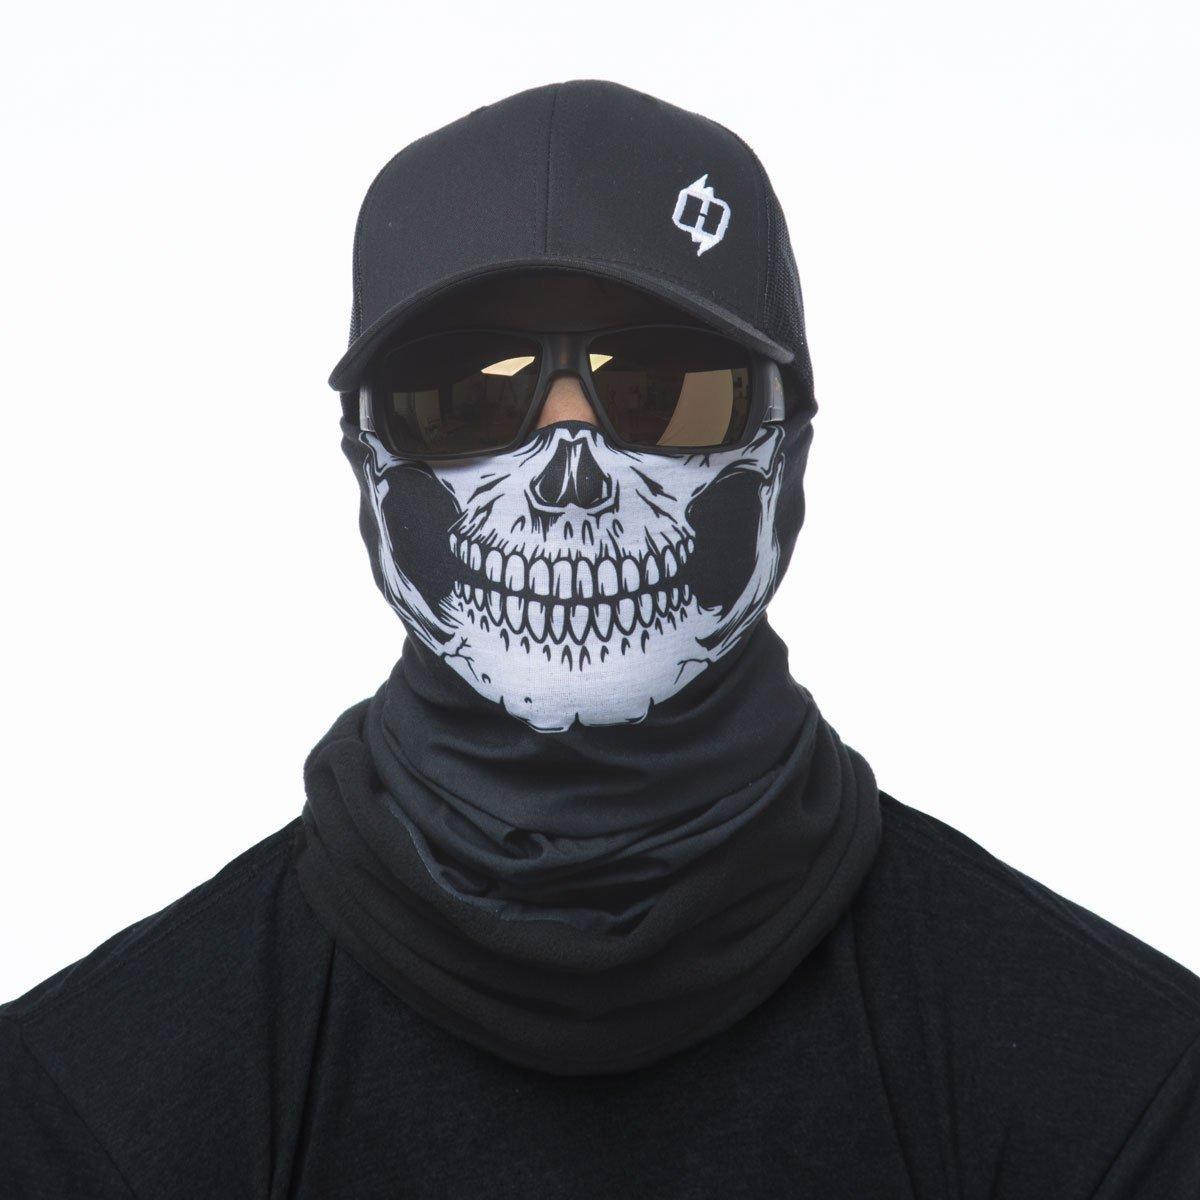 hoorag-sub-zero-skull-daddy-winter-fleece-face-mask